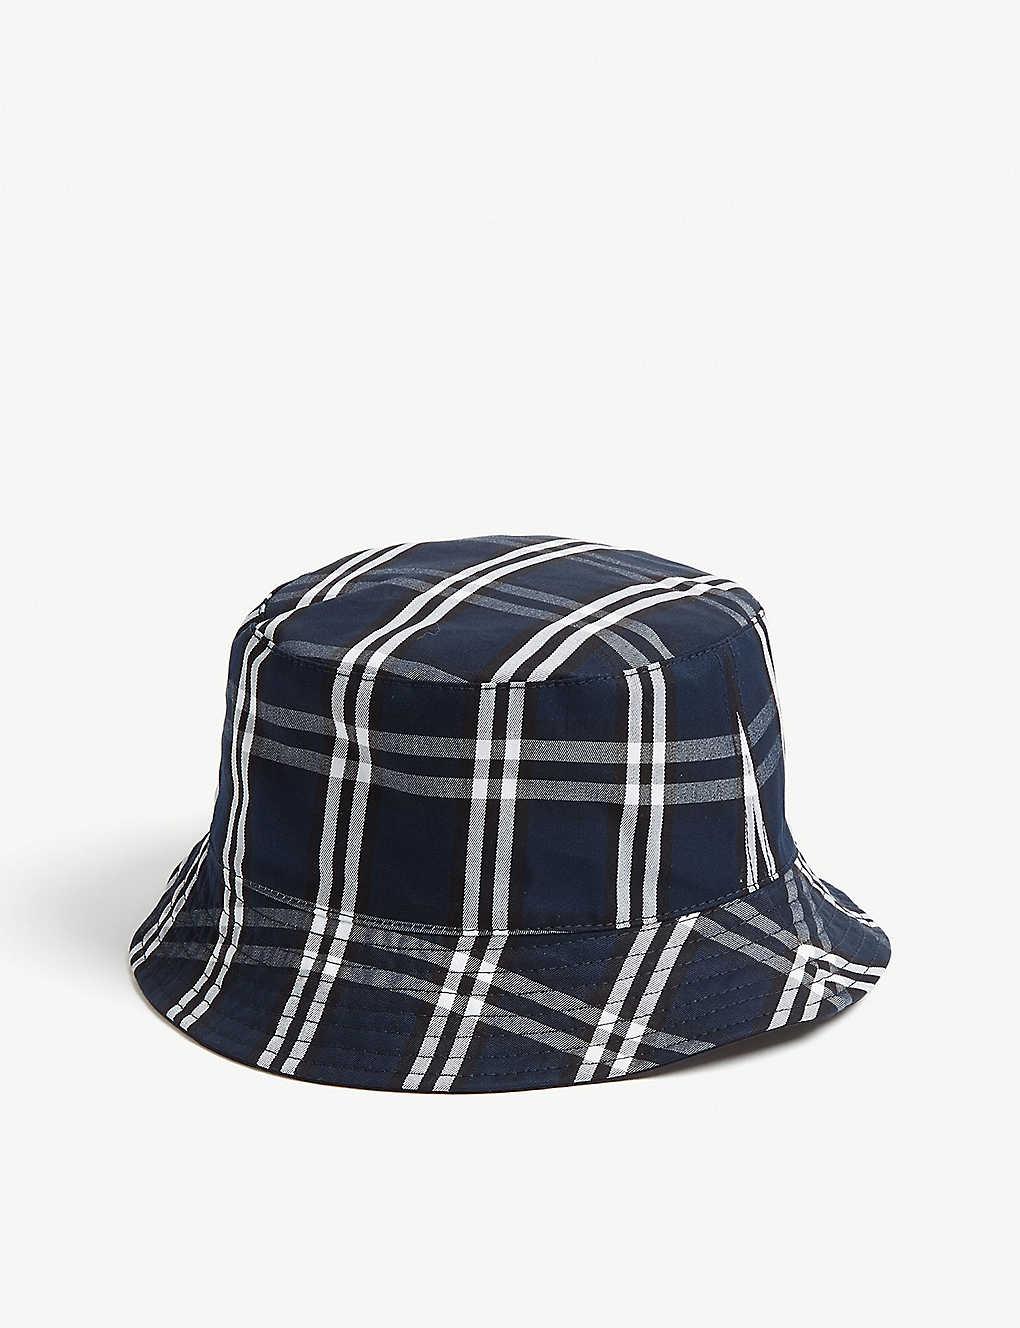 b6fb58374a2 Cotton tartan reversible bucket hat - Navy blue ...